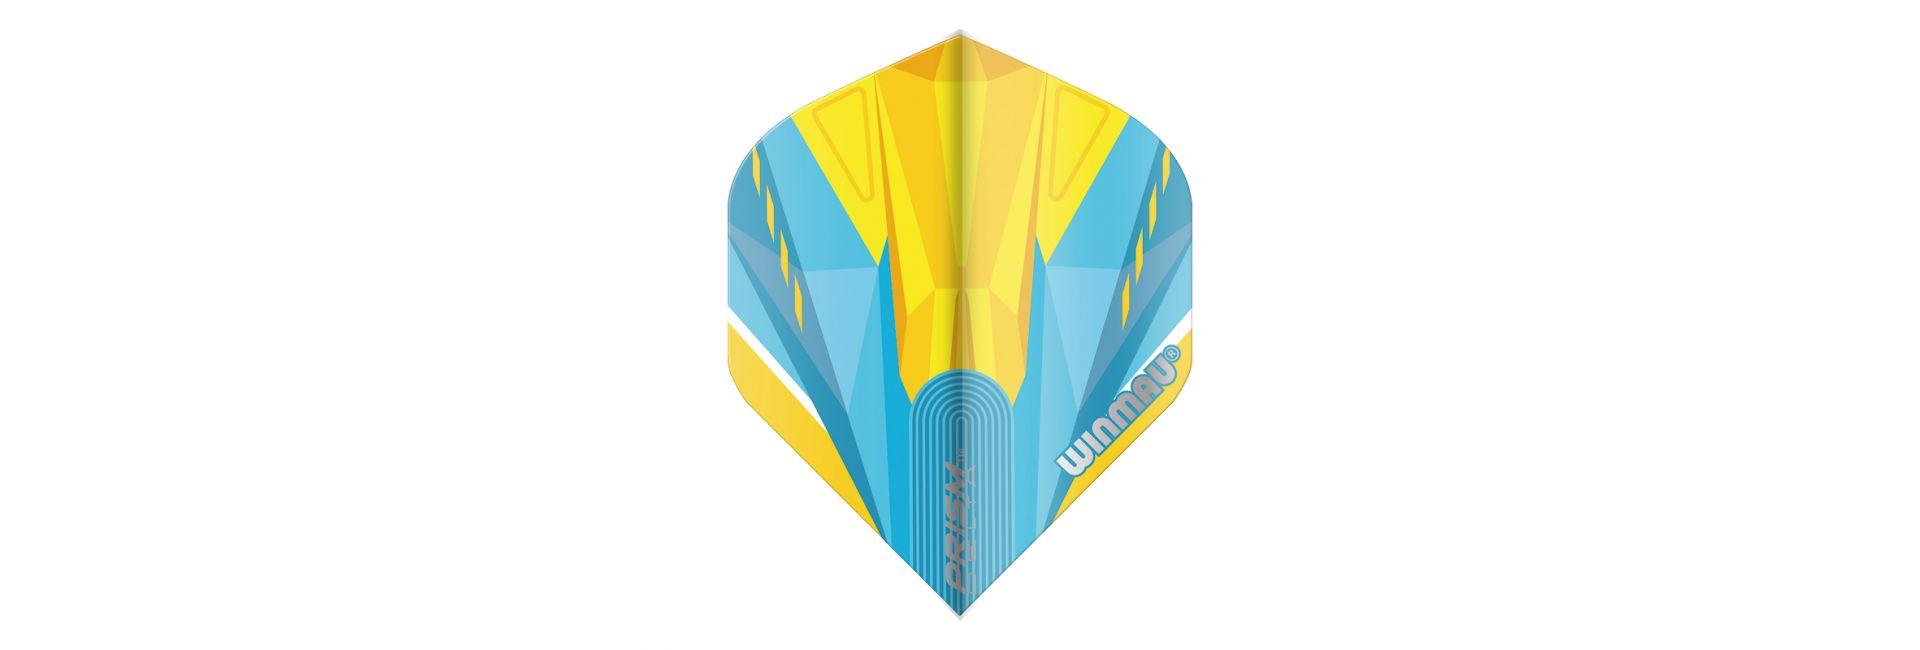 Winmau Prism Delta Blue & Yellow Dart Flights